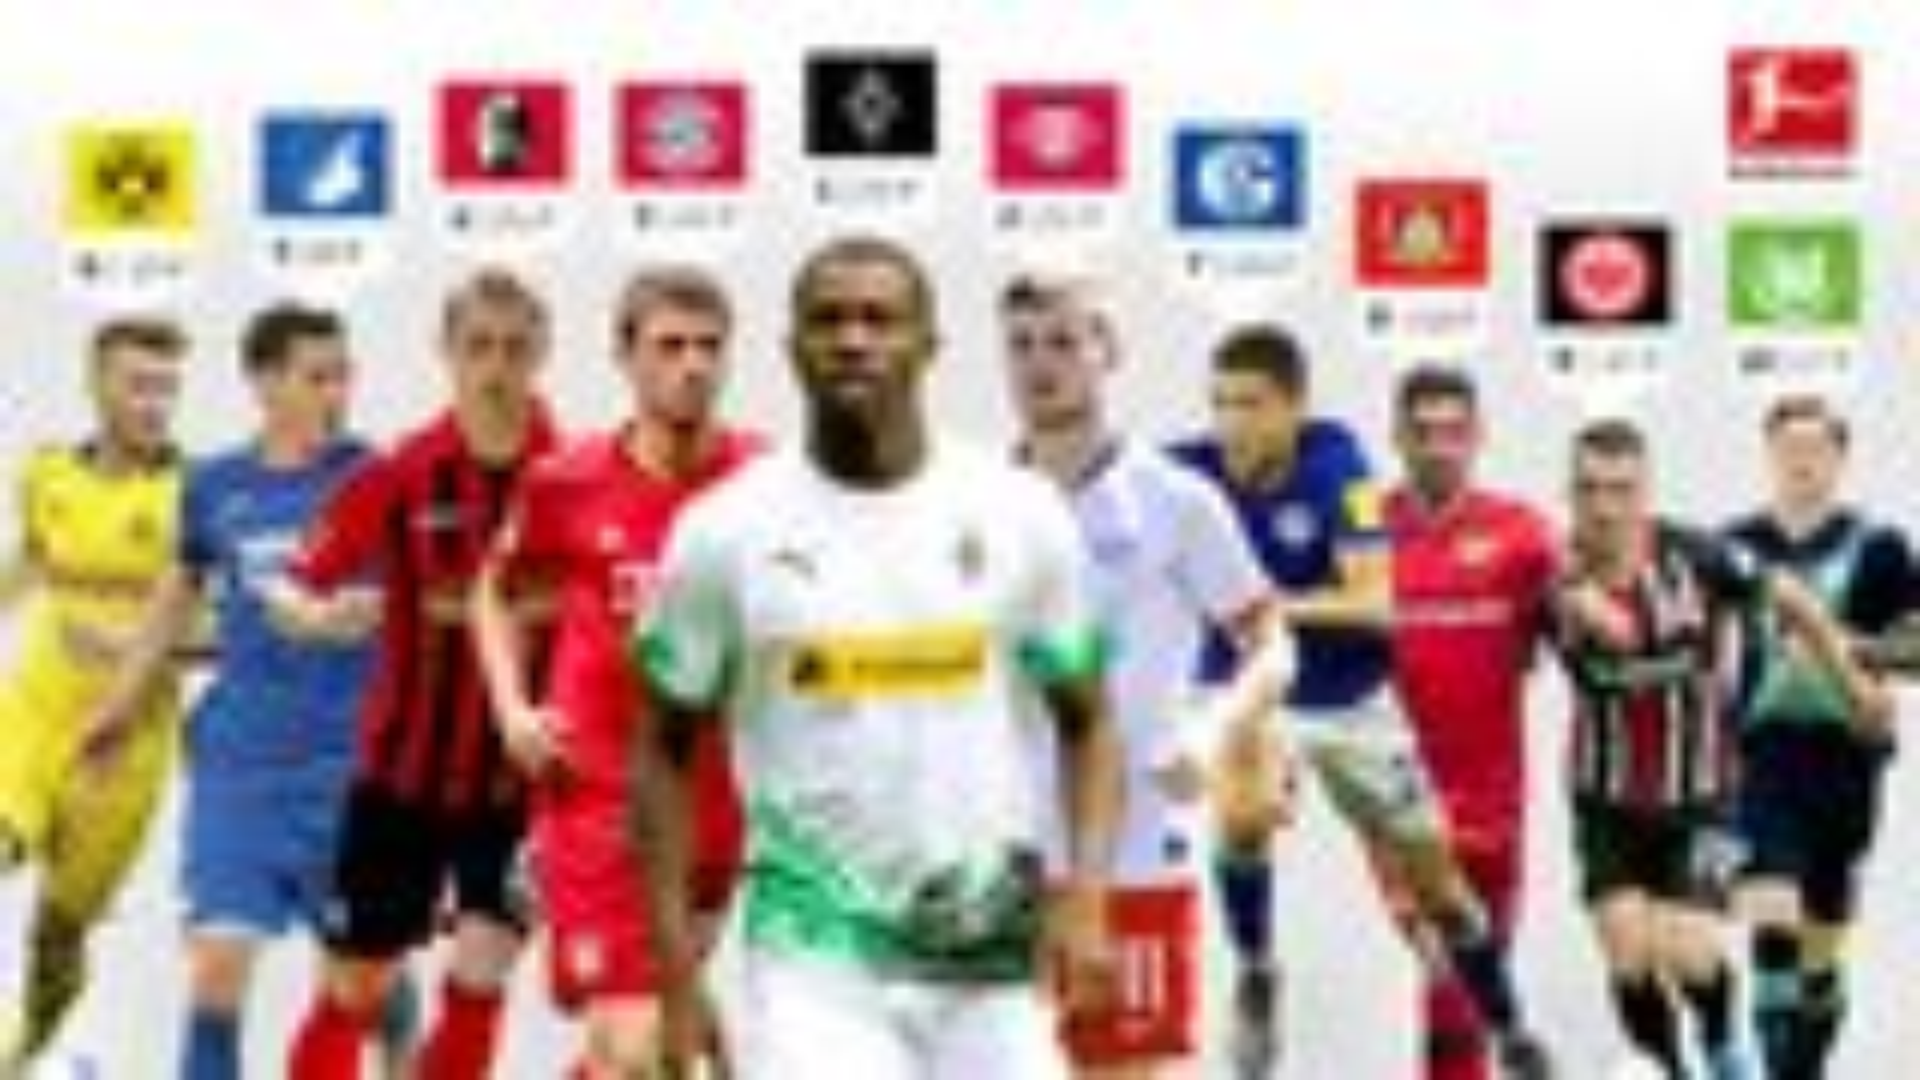 Gedränge im Verfolgerfeld: Neun Clubs jagen Gladbach